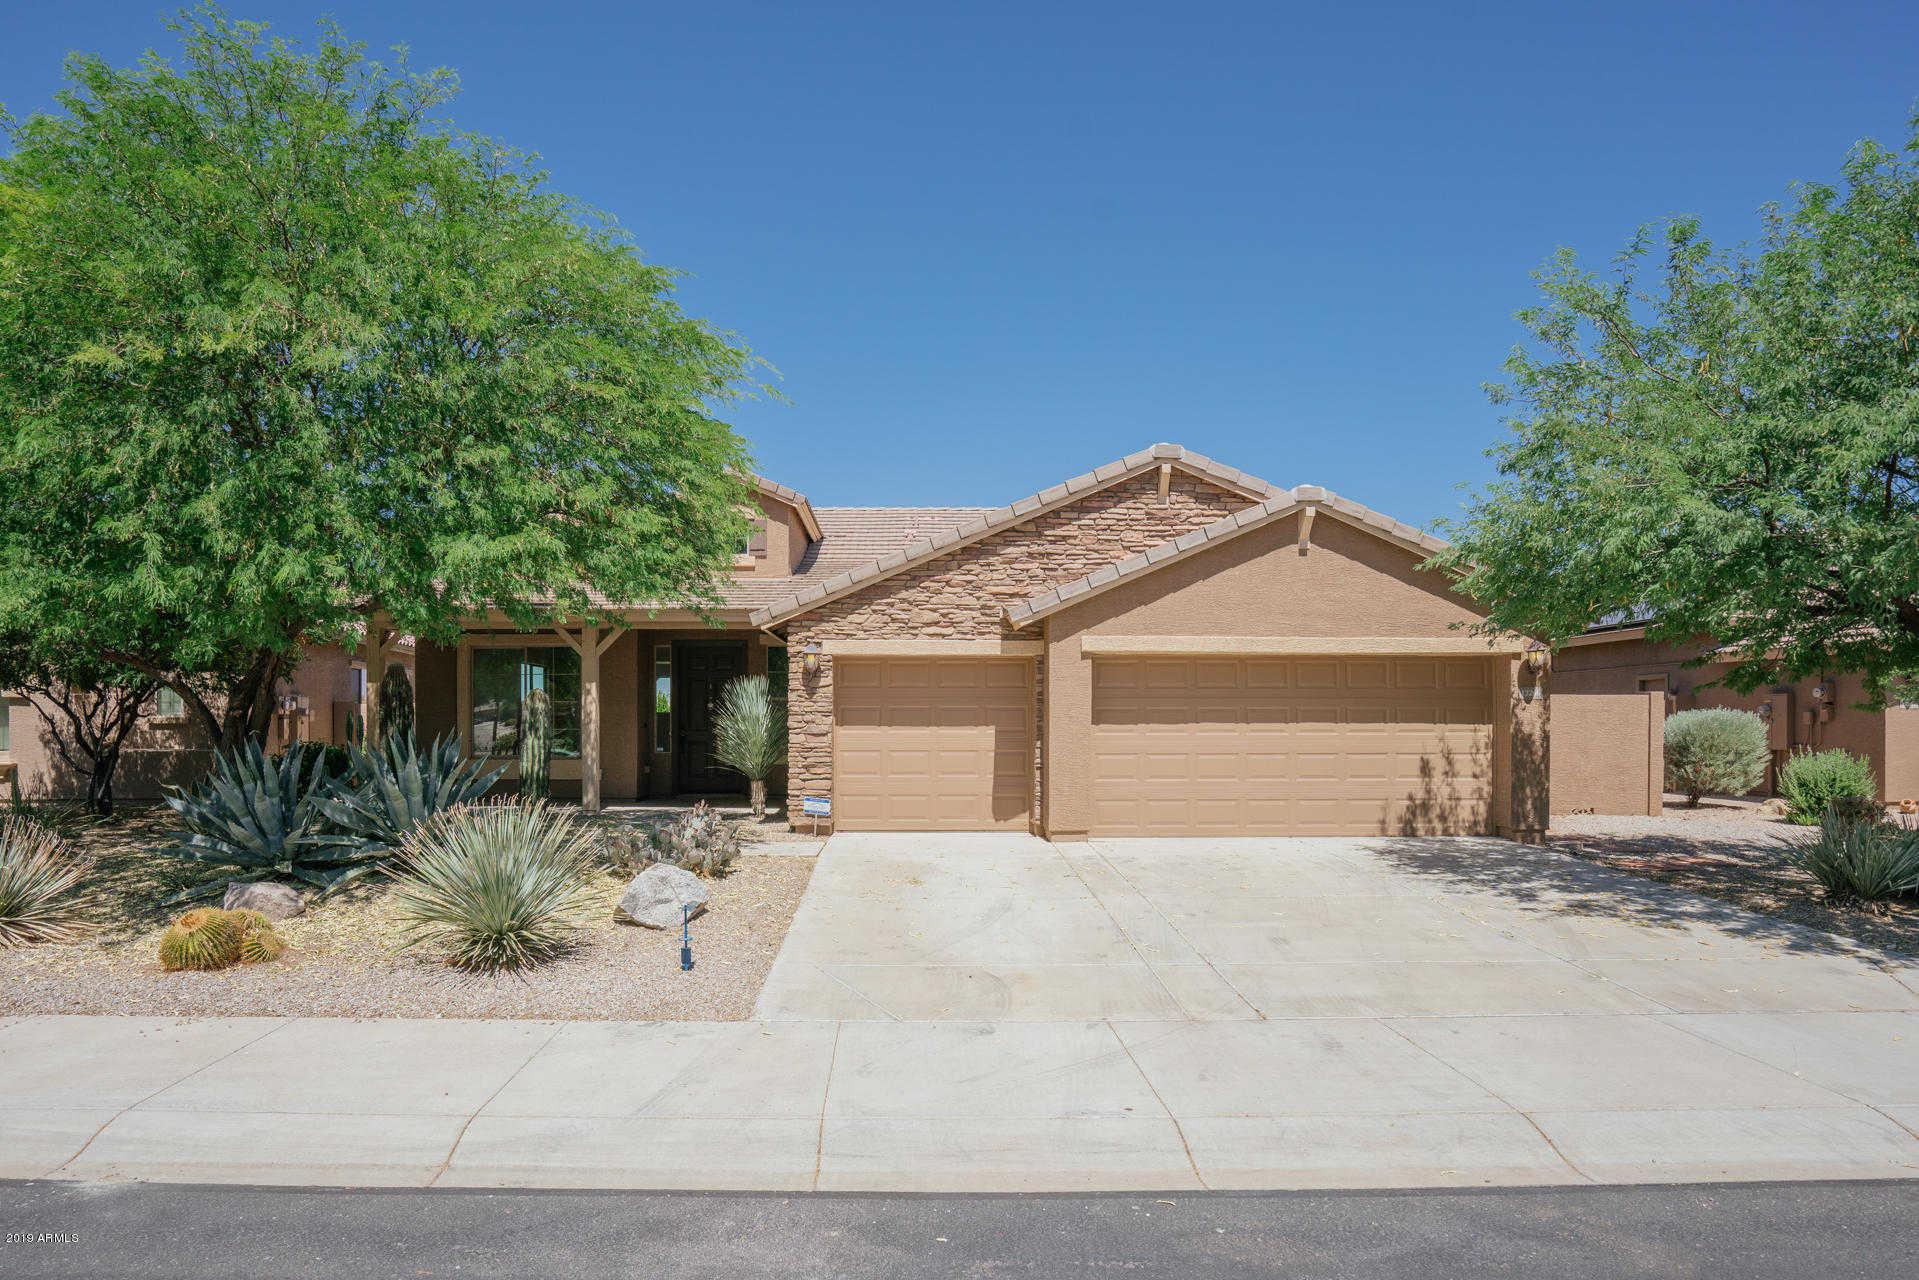 $336,000 - 4Br/2Ba - Home for Sale in Estrella Mountain Ranch Parcel 96b, Goodyear